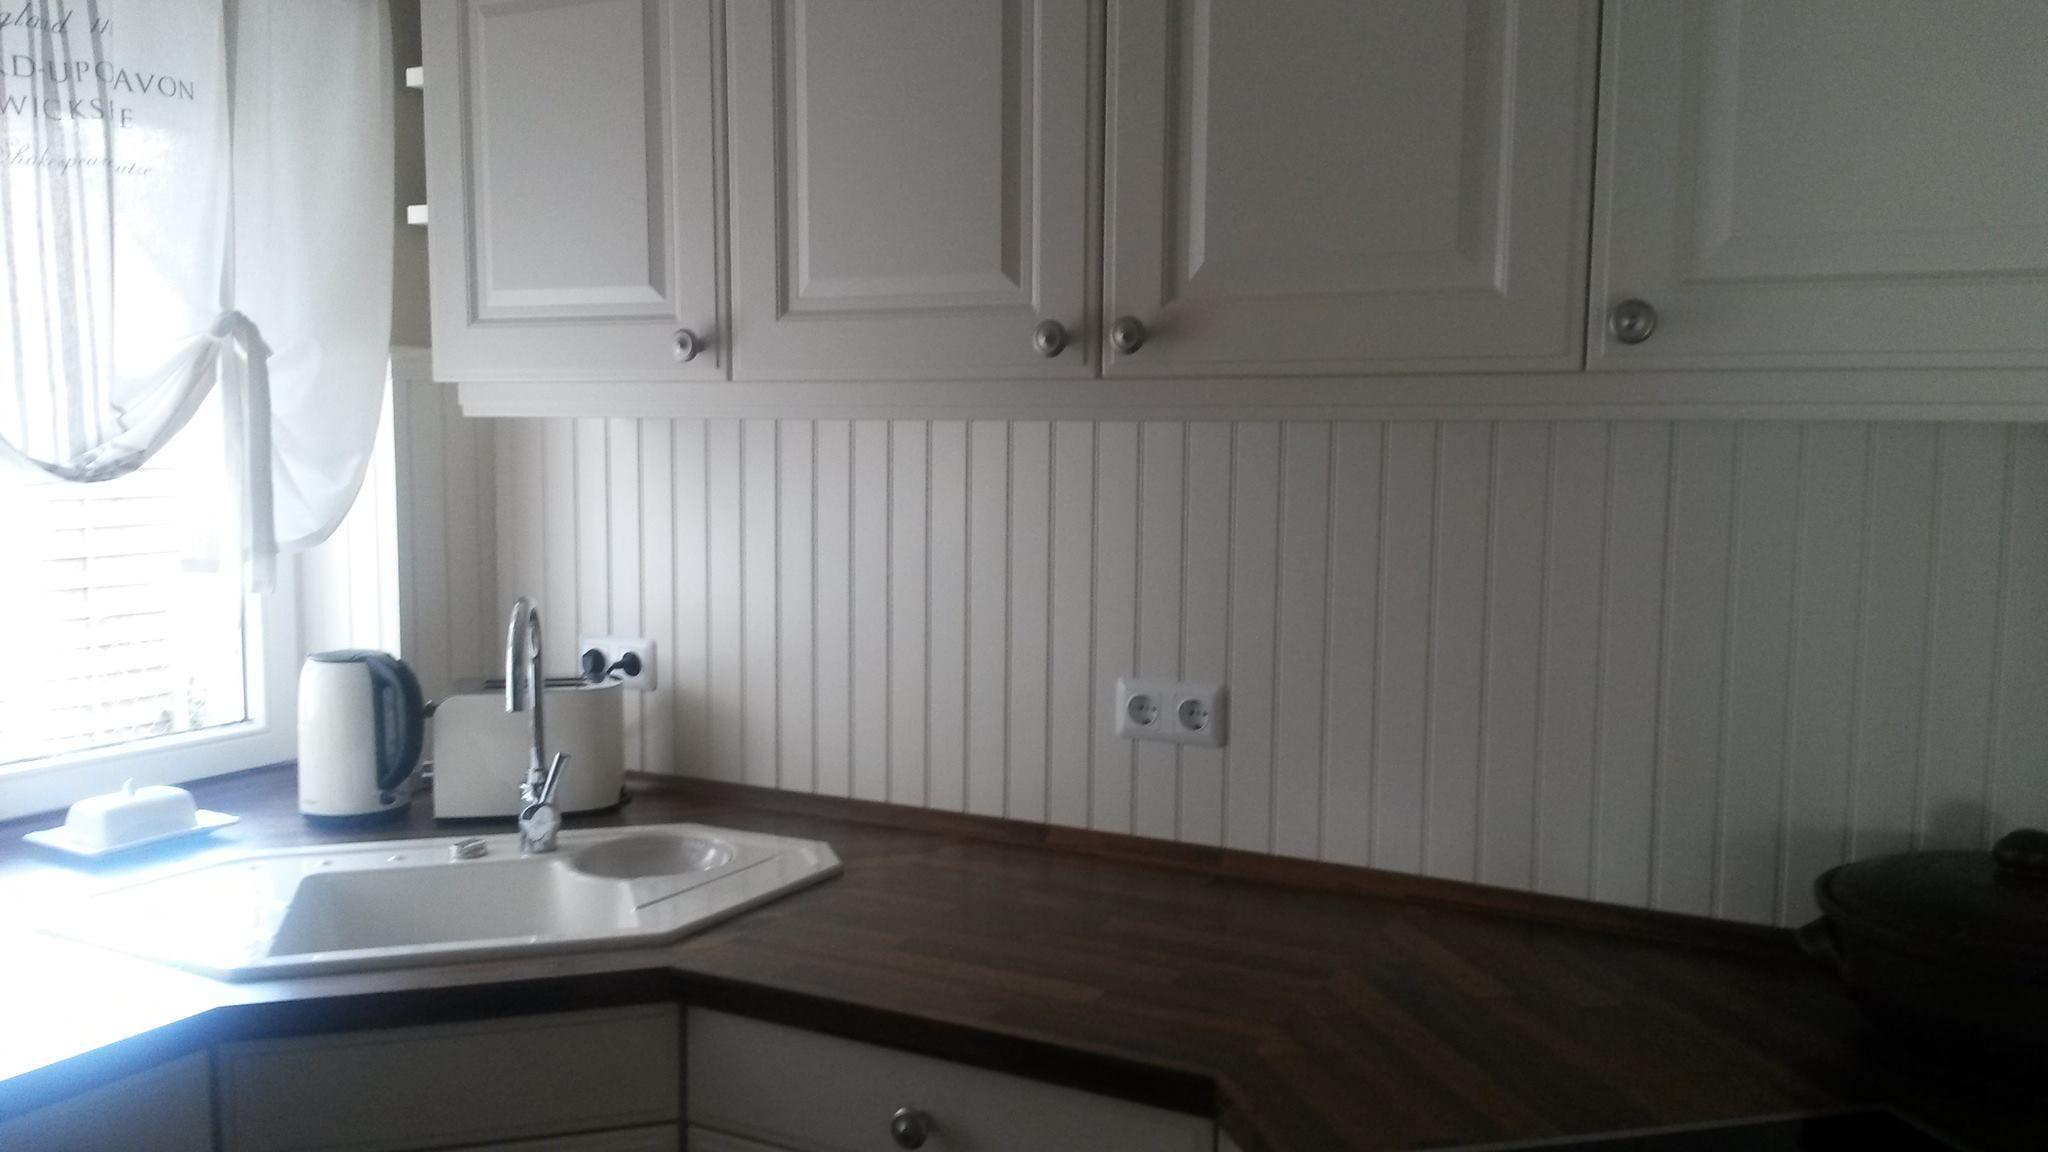 Fliesenspiegel mal anders Wandgestaltung Landhaus Wandverkleidung neue Kche Ikea Kche